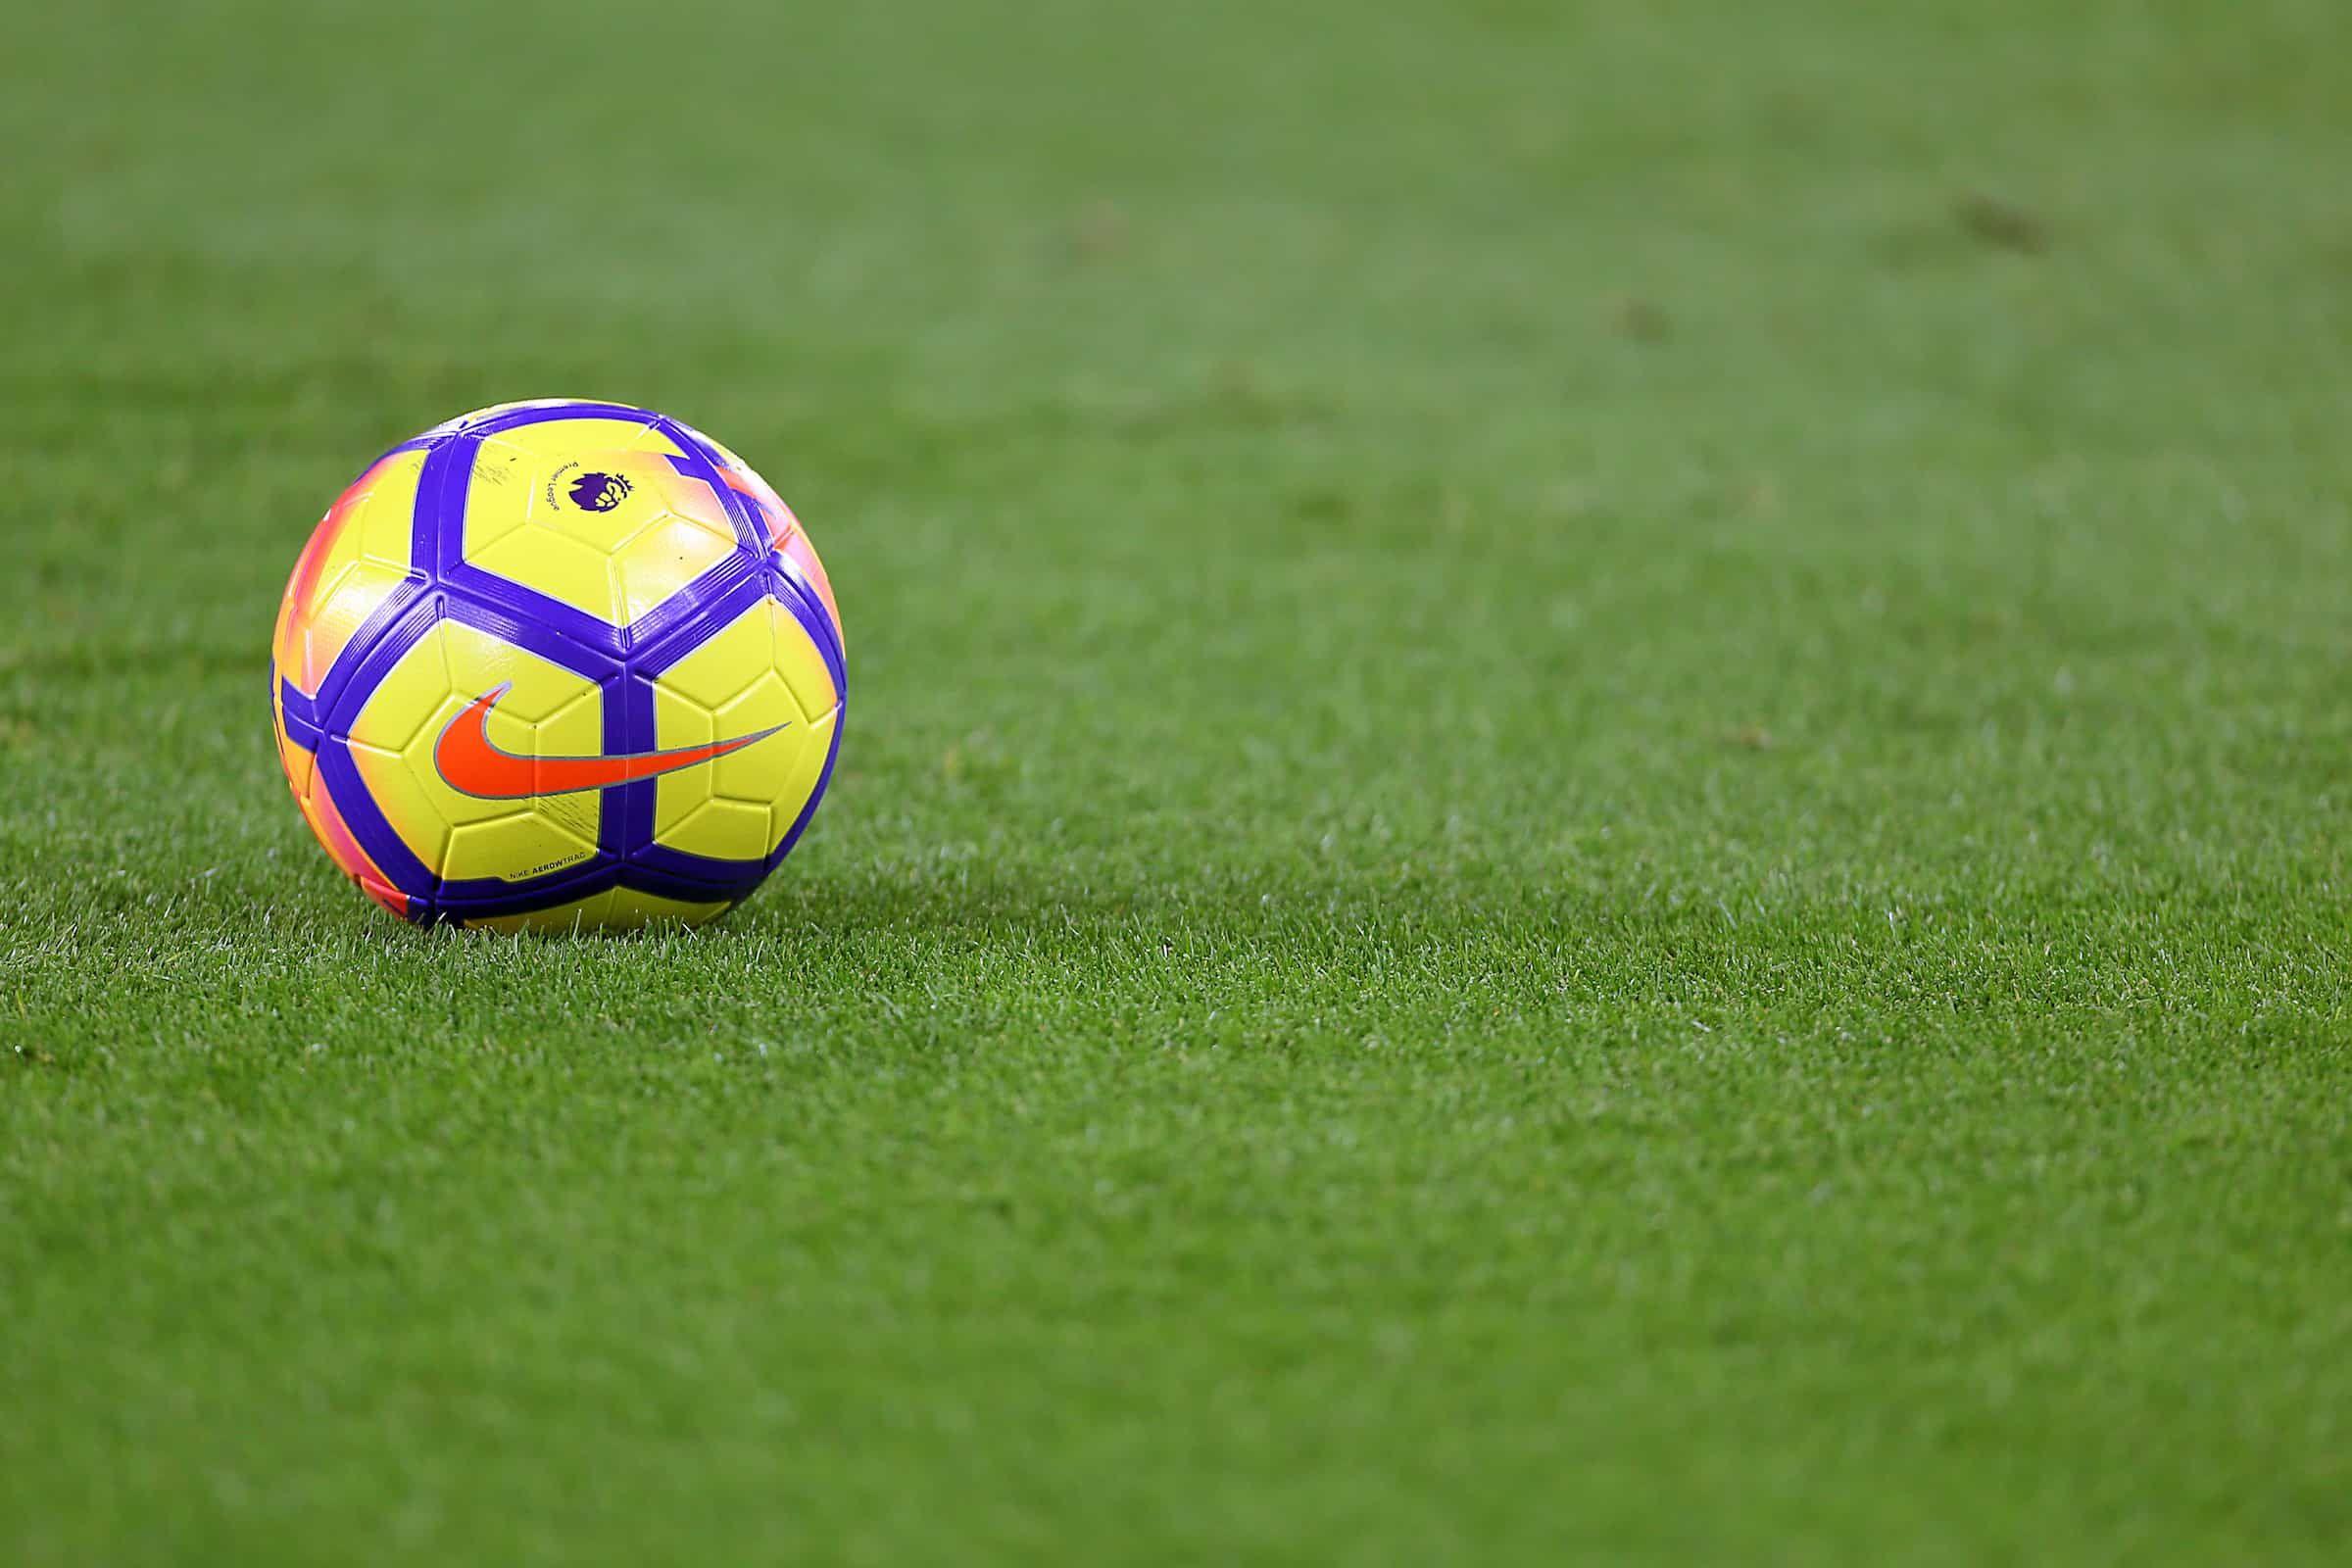 Weekend Premier League Preview (With images) Premier